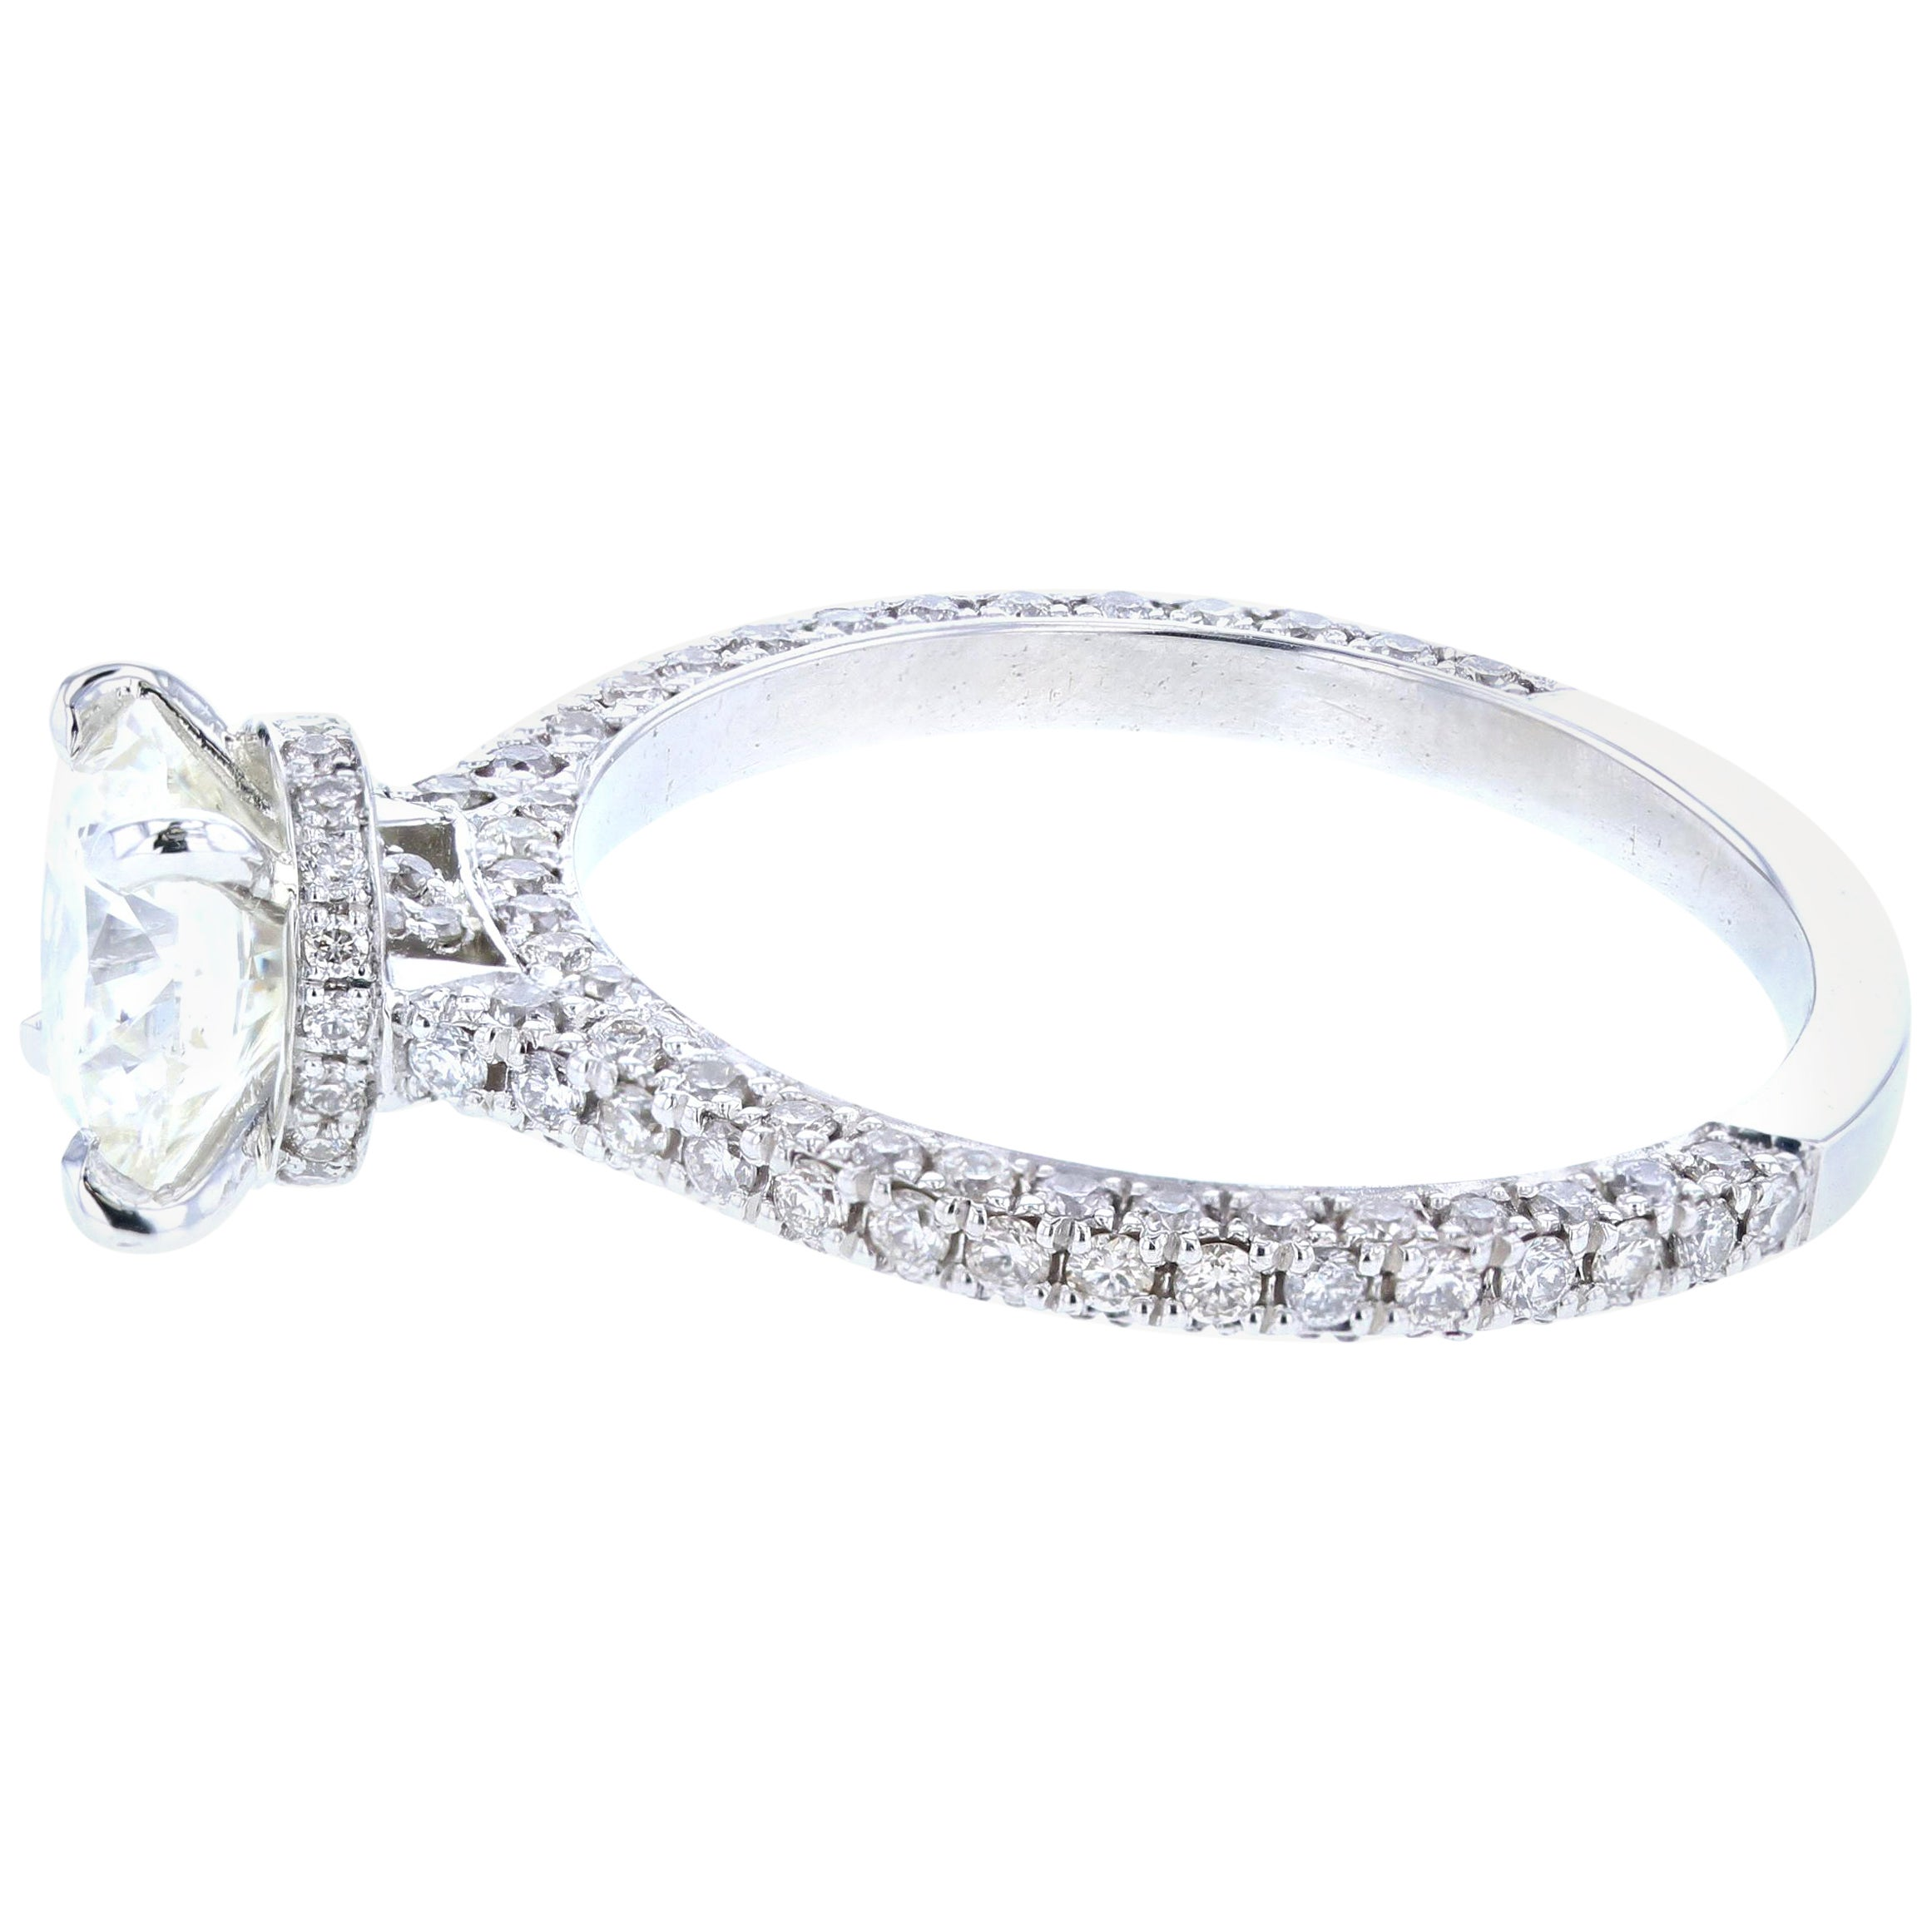 Hidden Halo Round Diamond Engagement Ring 'Certified' Platinum Diamond Setting